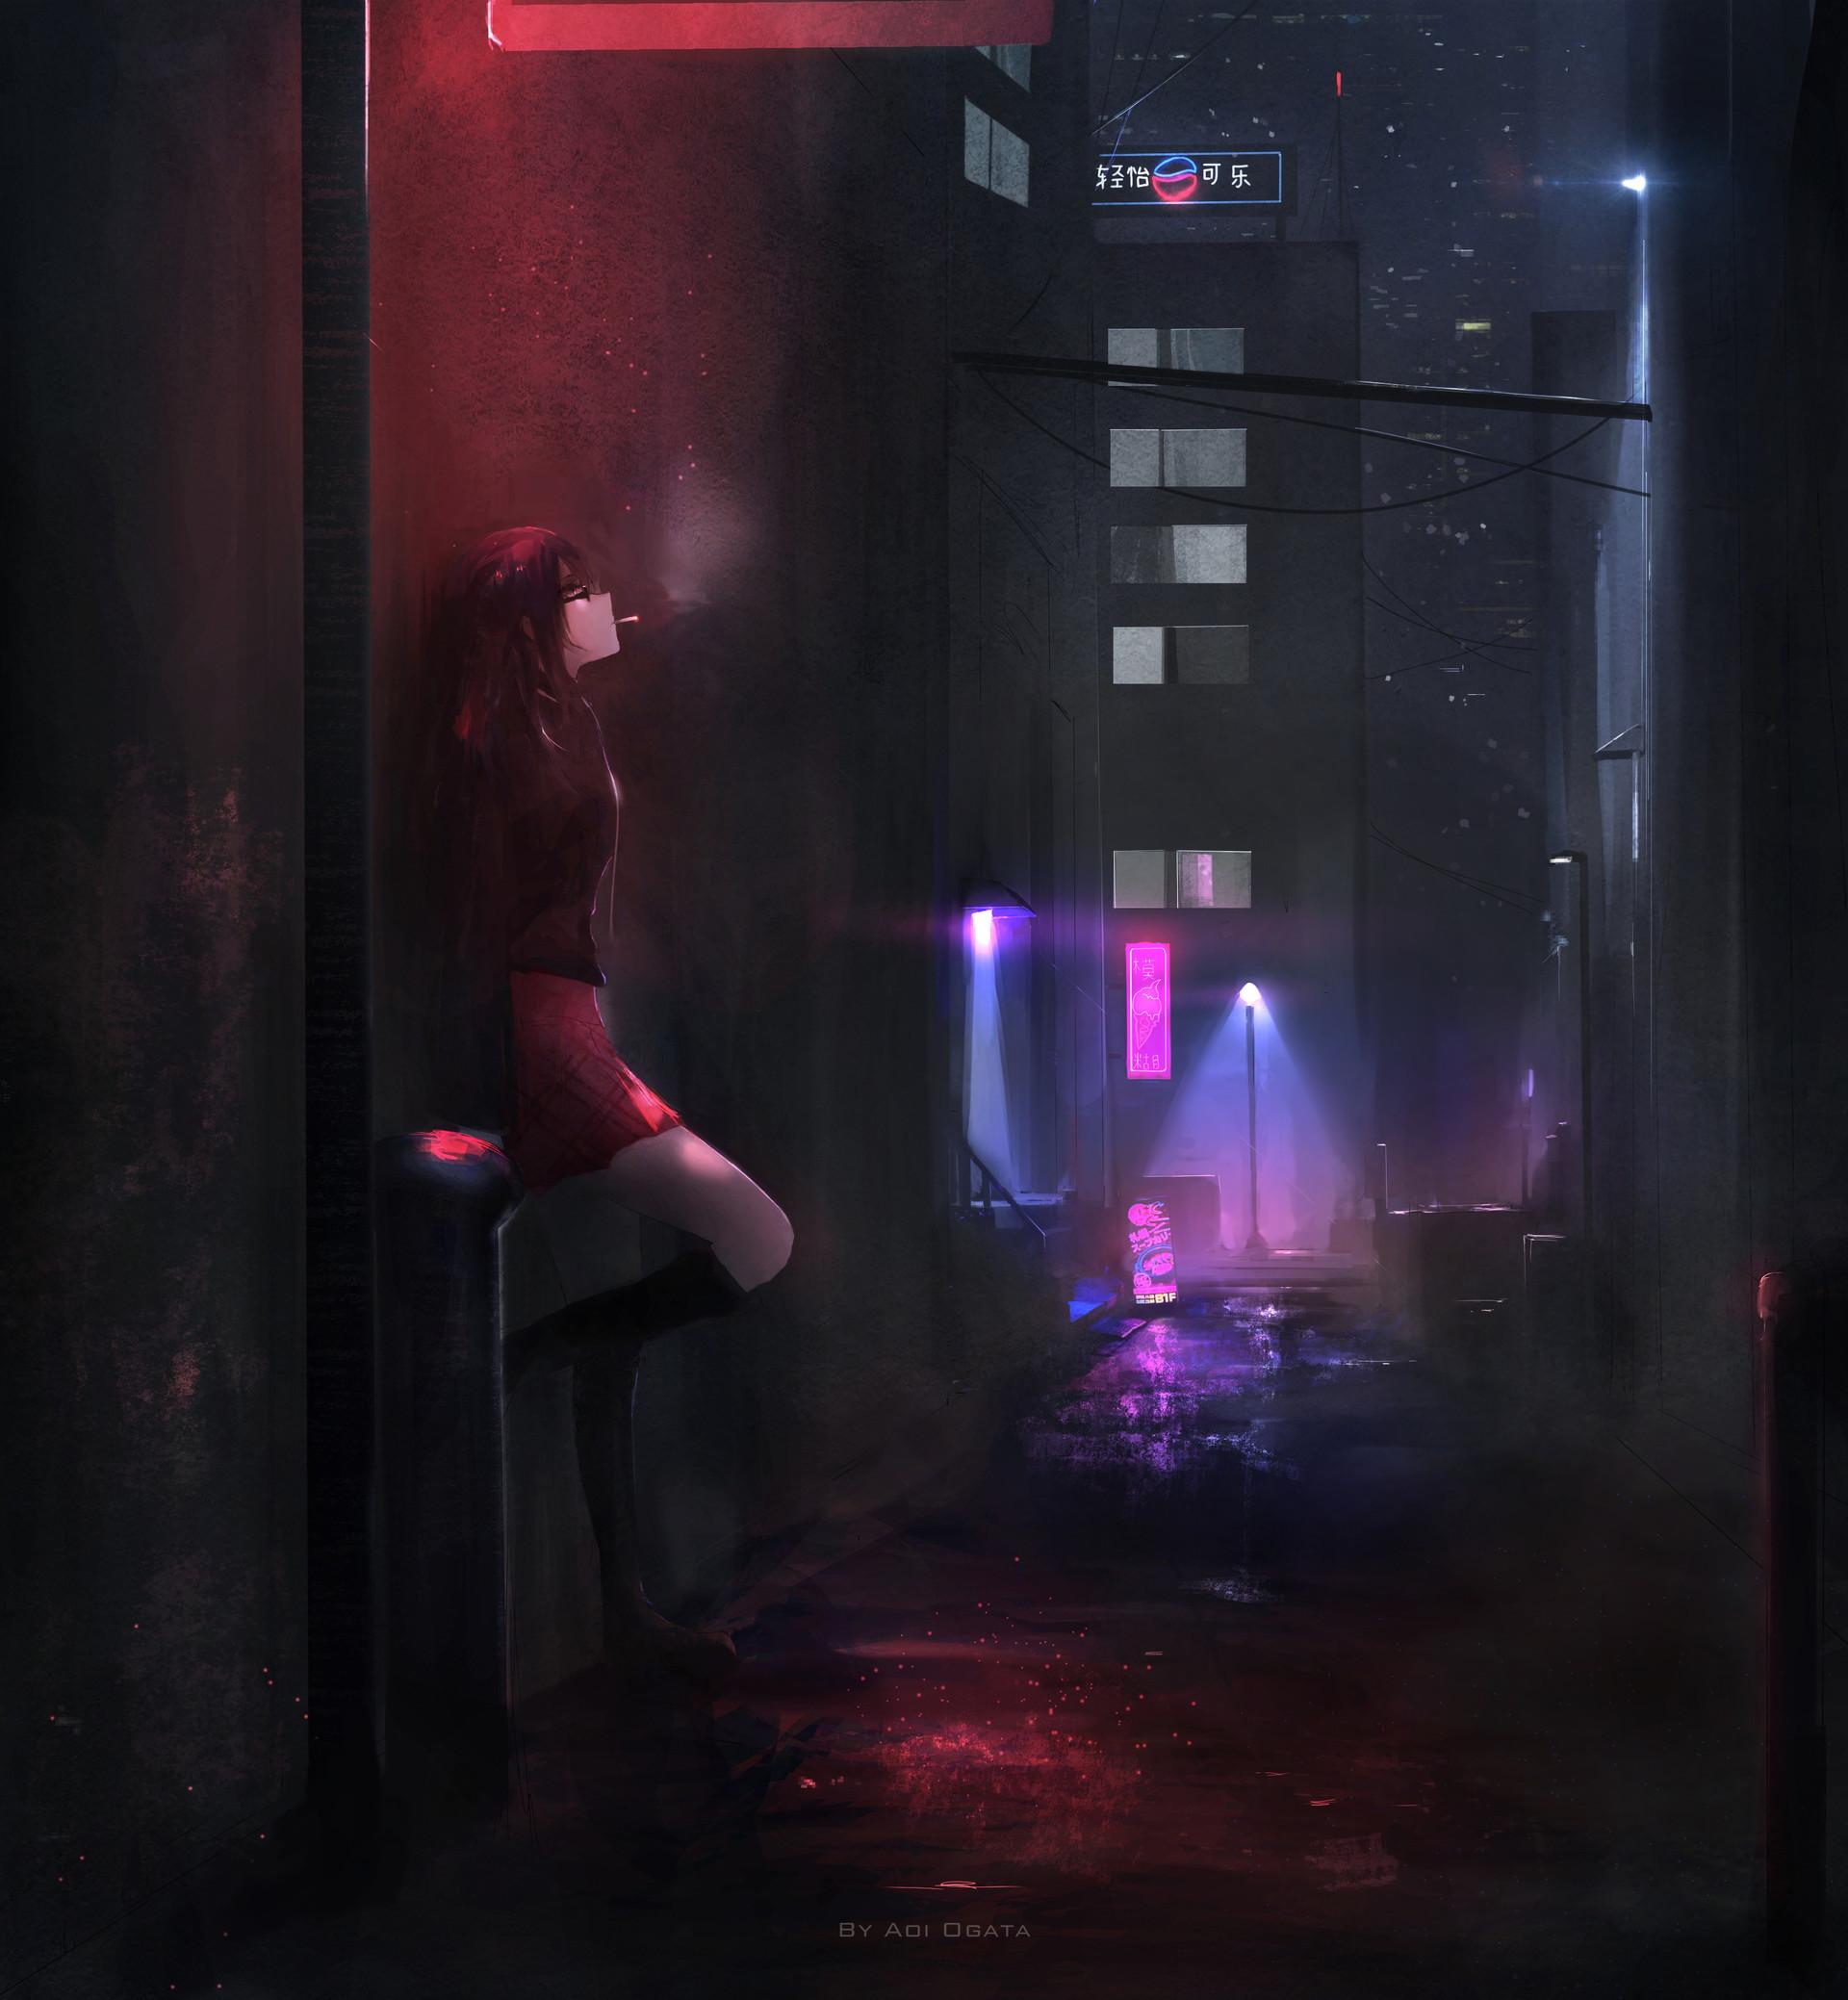 Girl In Rain Hd Wallpaper Aoi Ogata Dark Alley